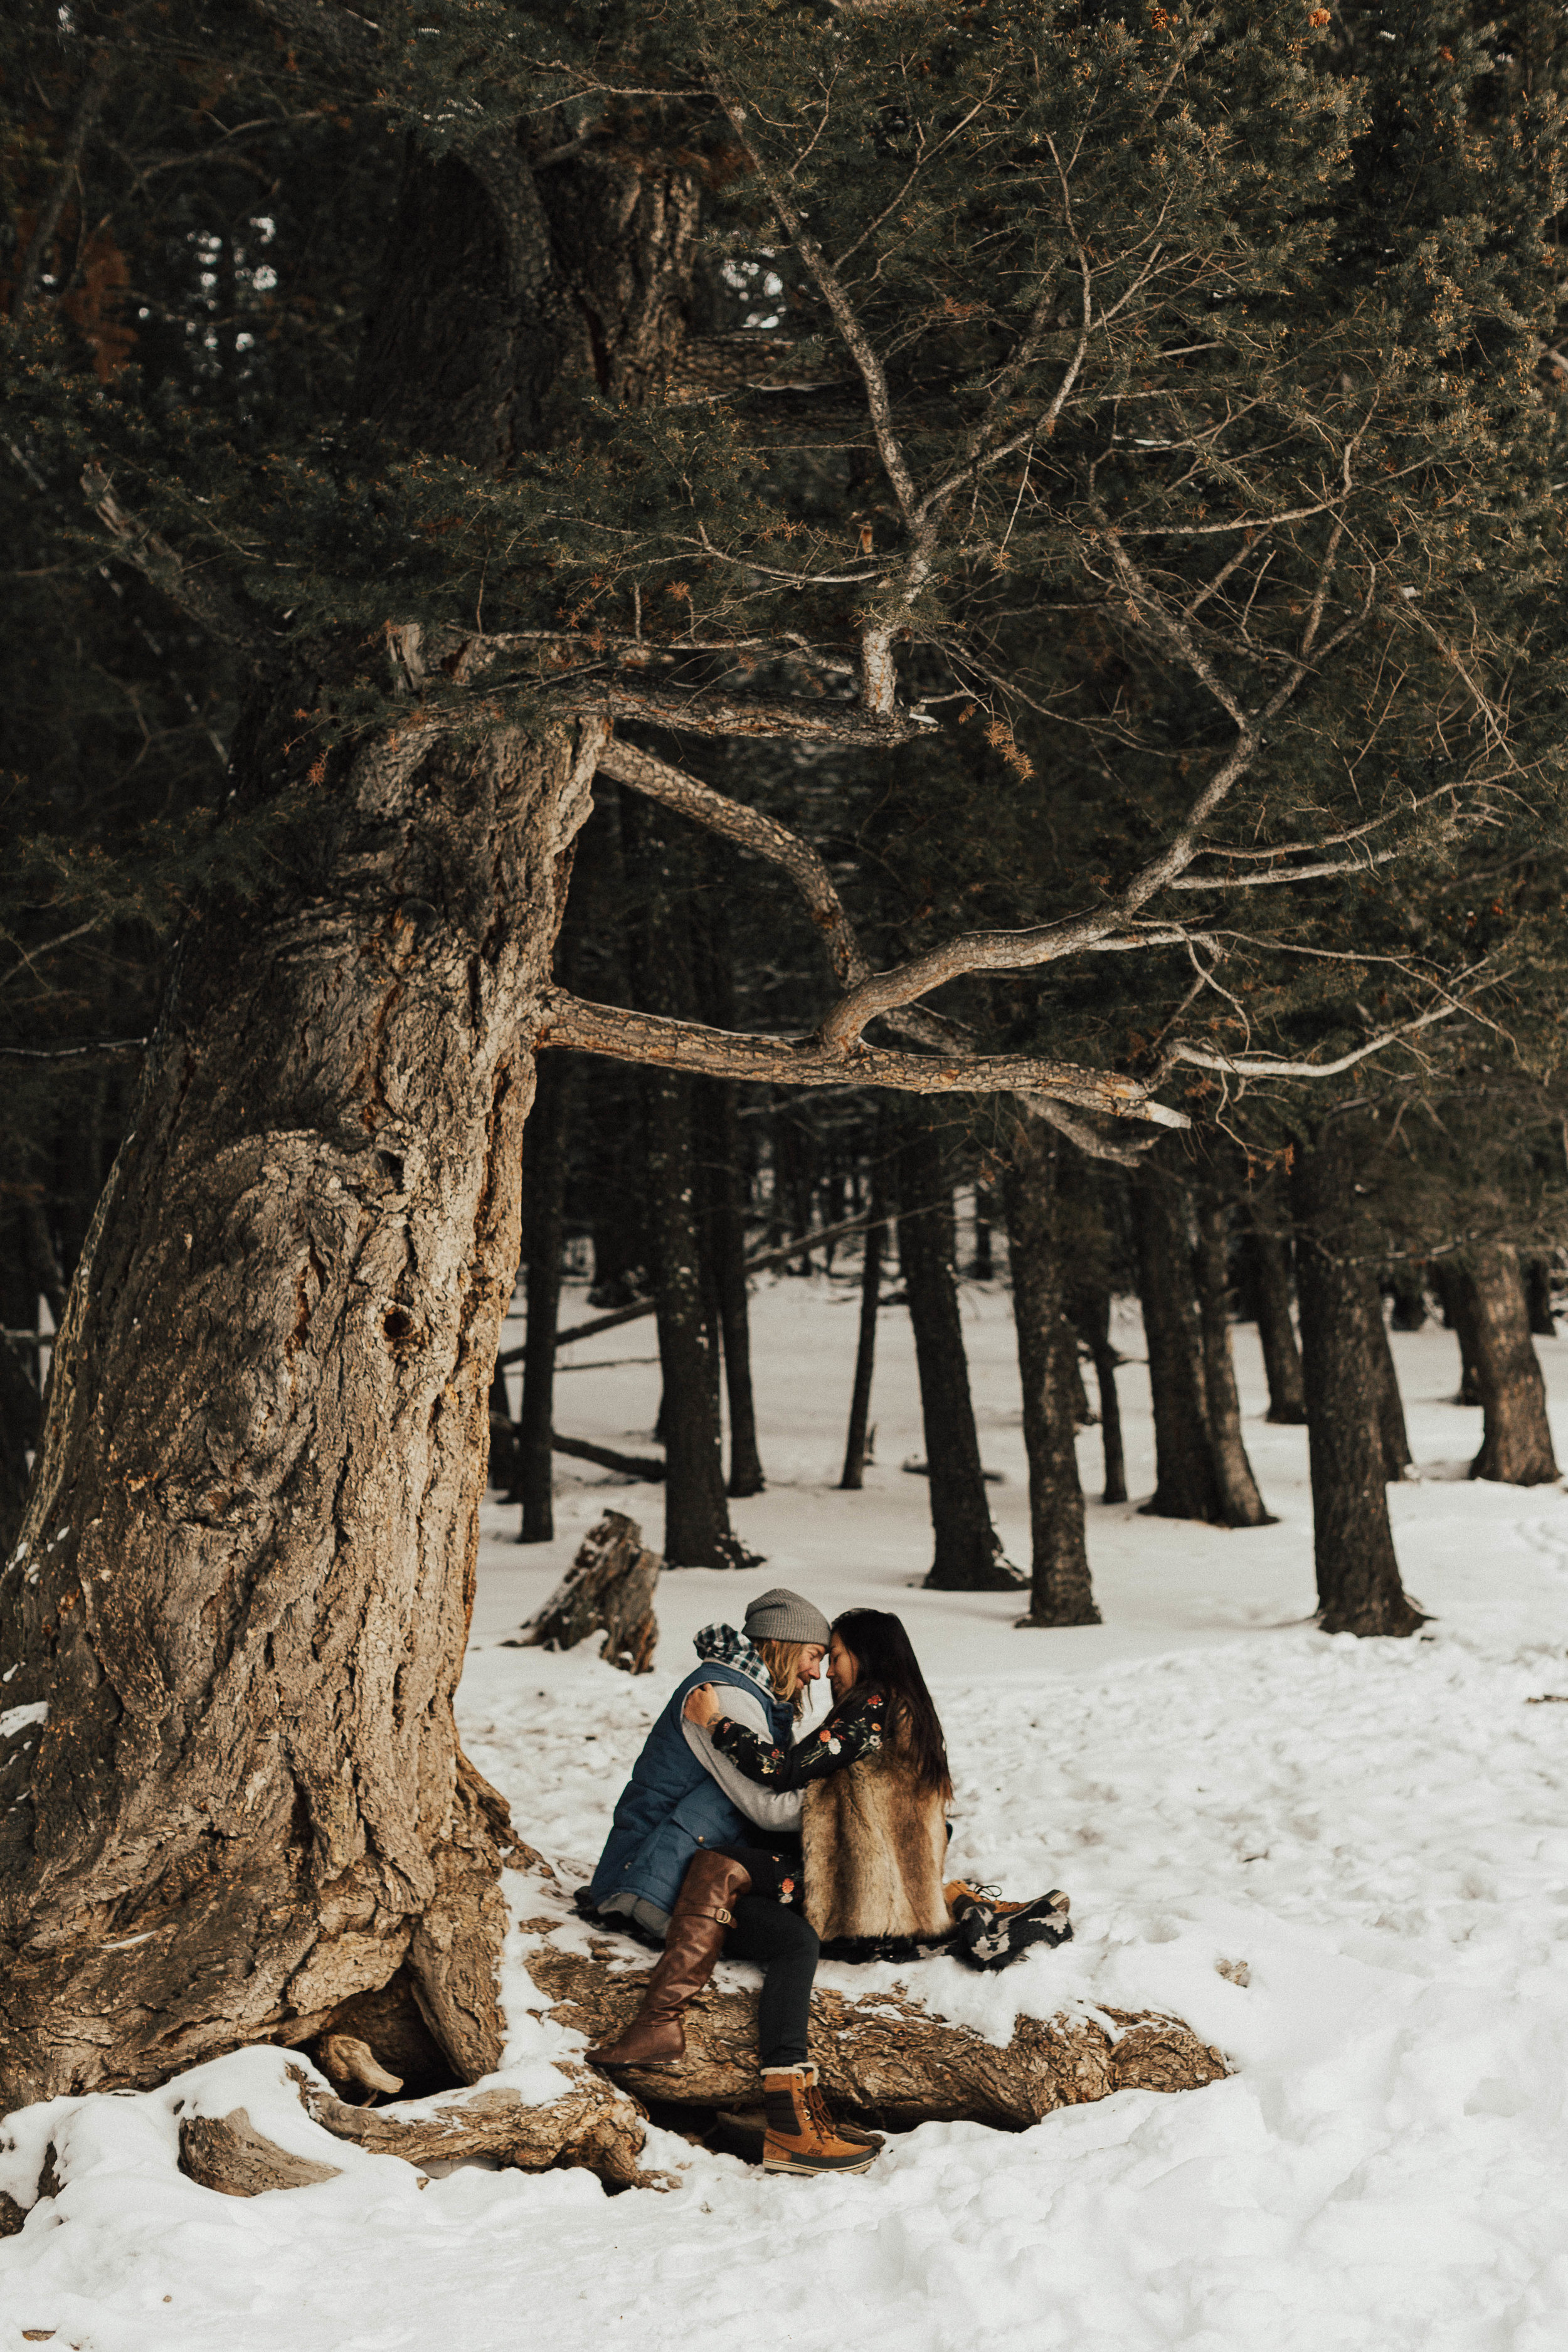 Banff Engagement Photographer - Winter Mountain Adventure Engagement Session - Michelle Larmand Photography-066